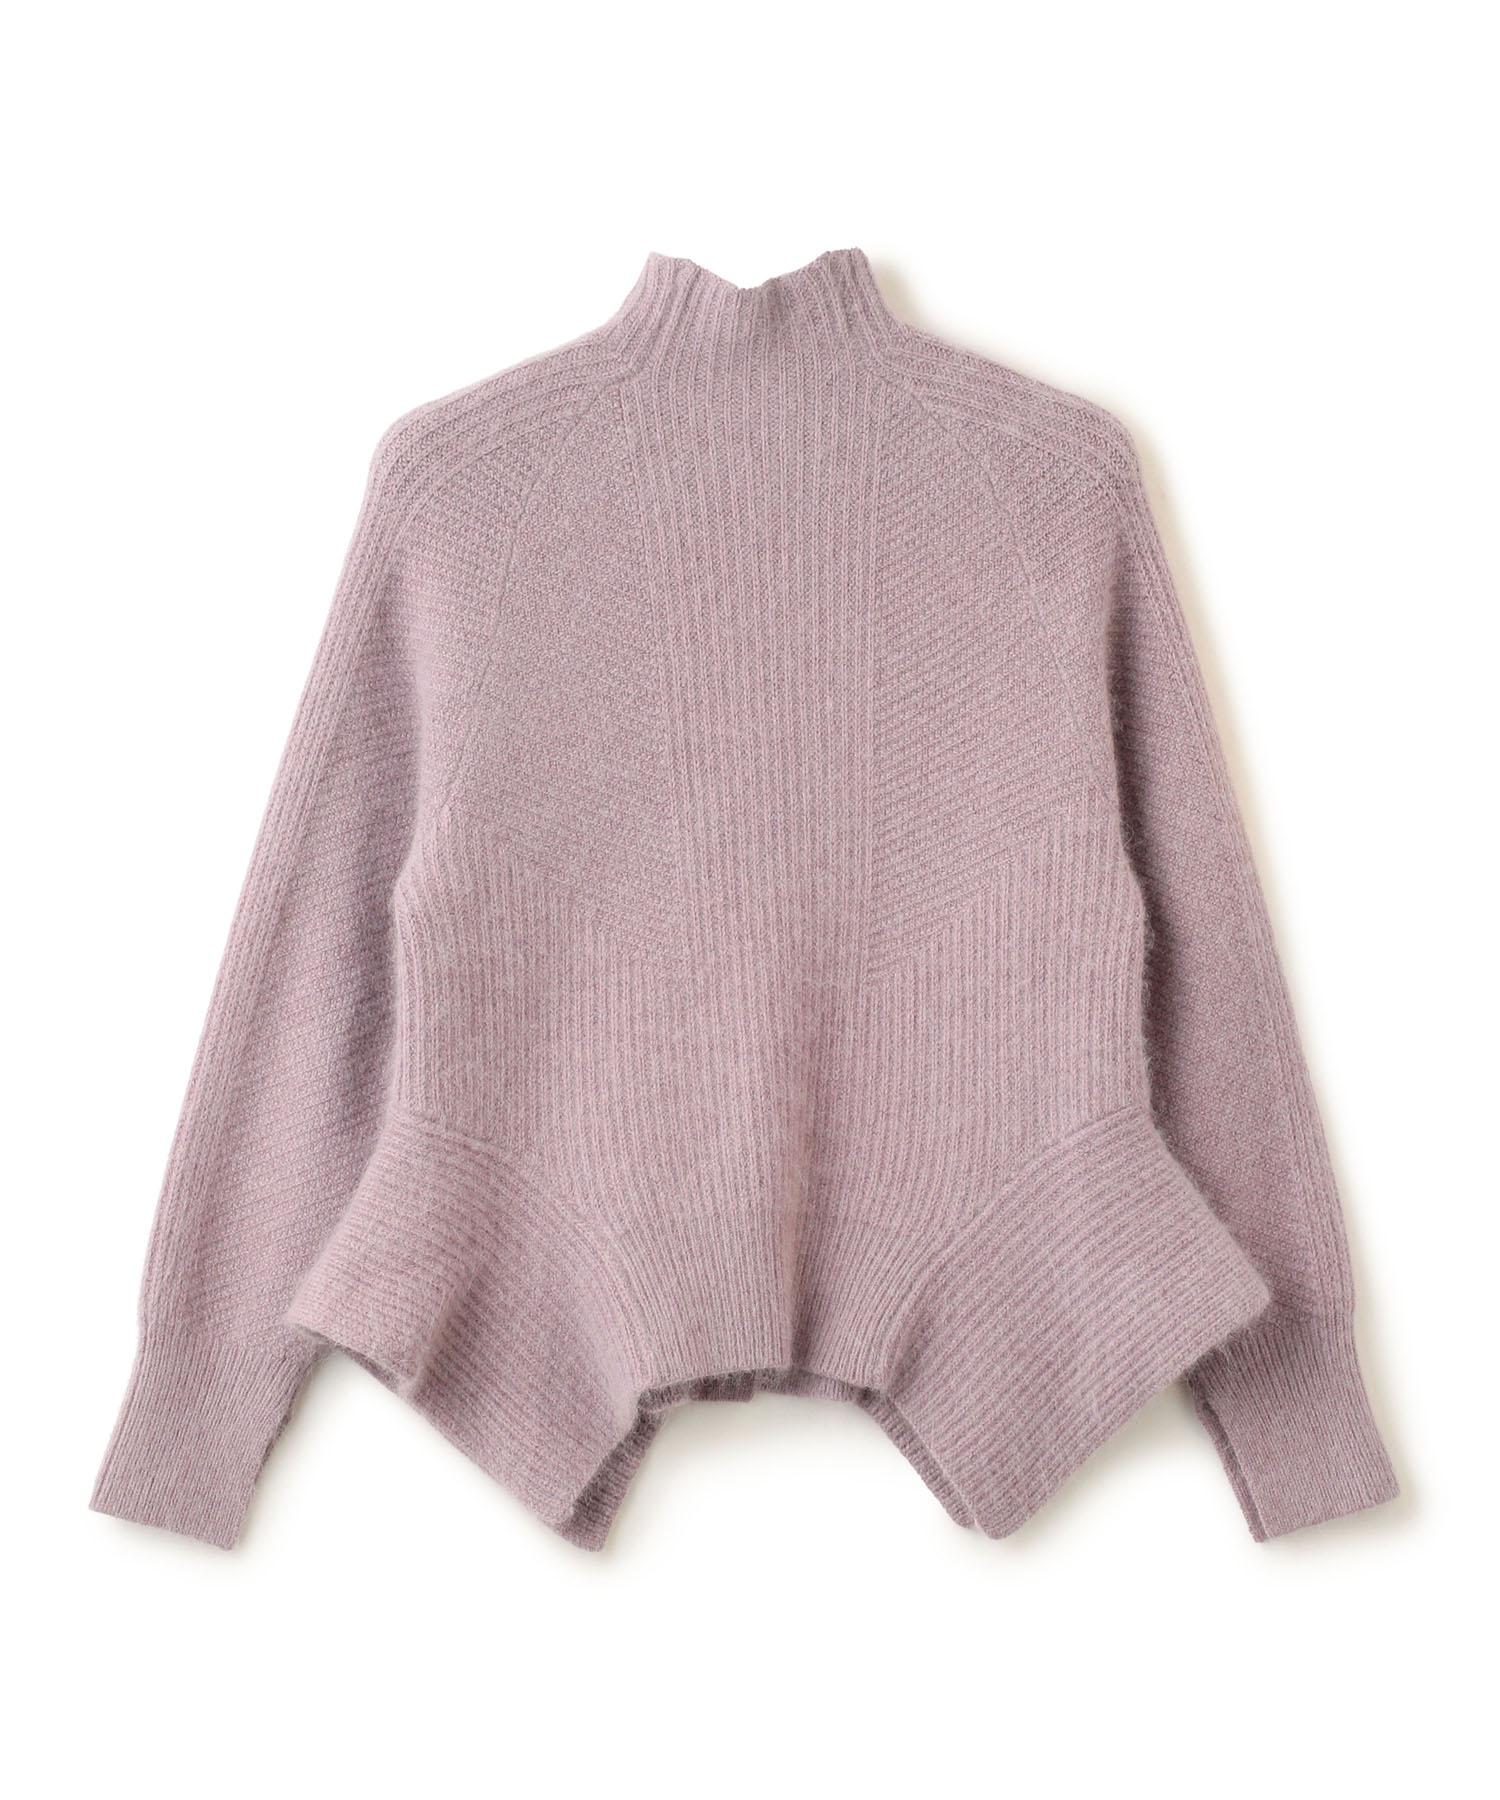 7G Bottleneck Knit Pullover